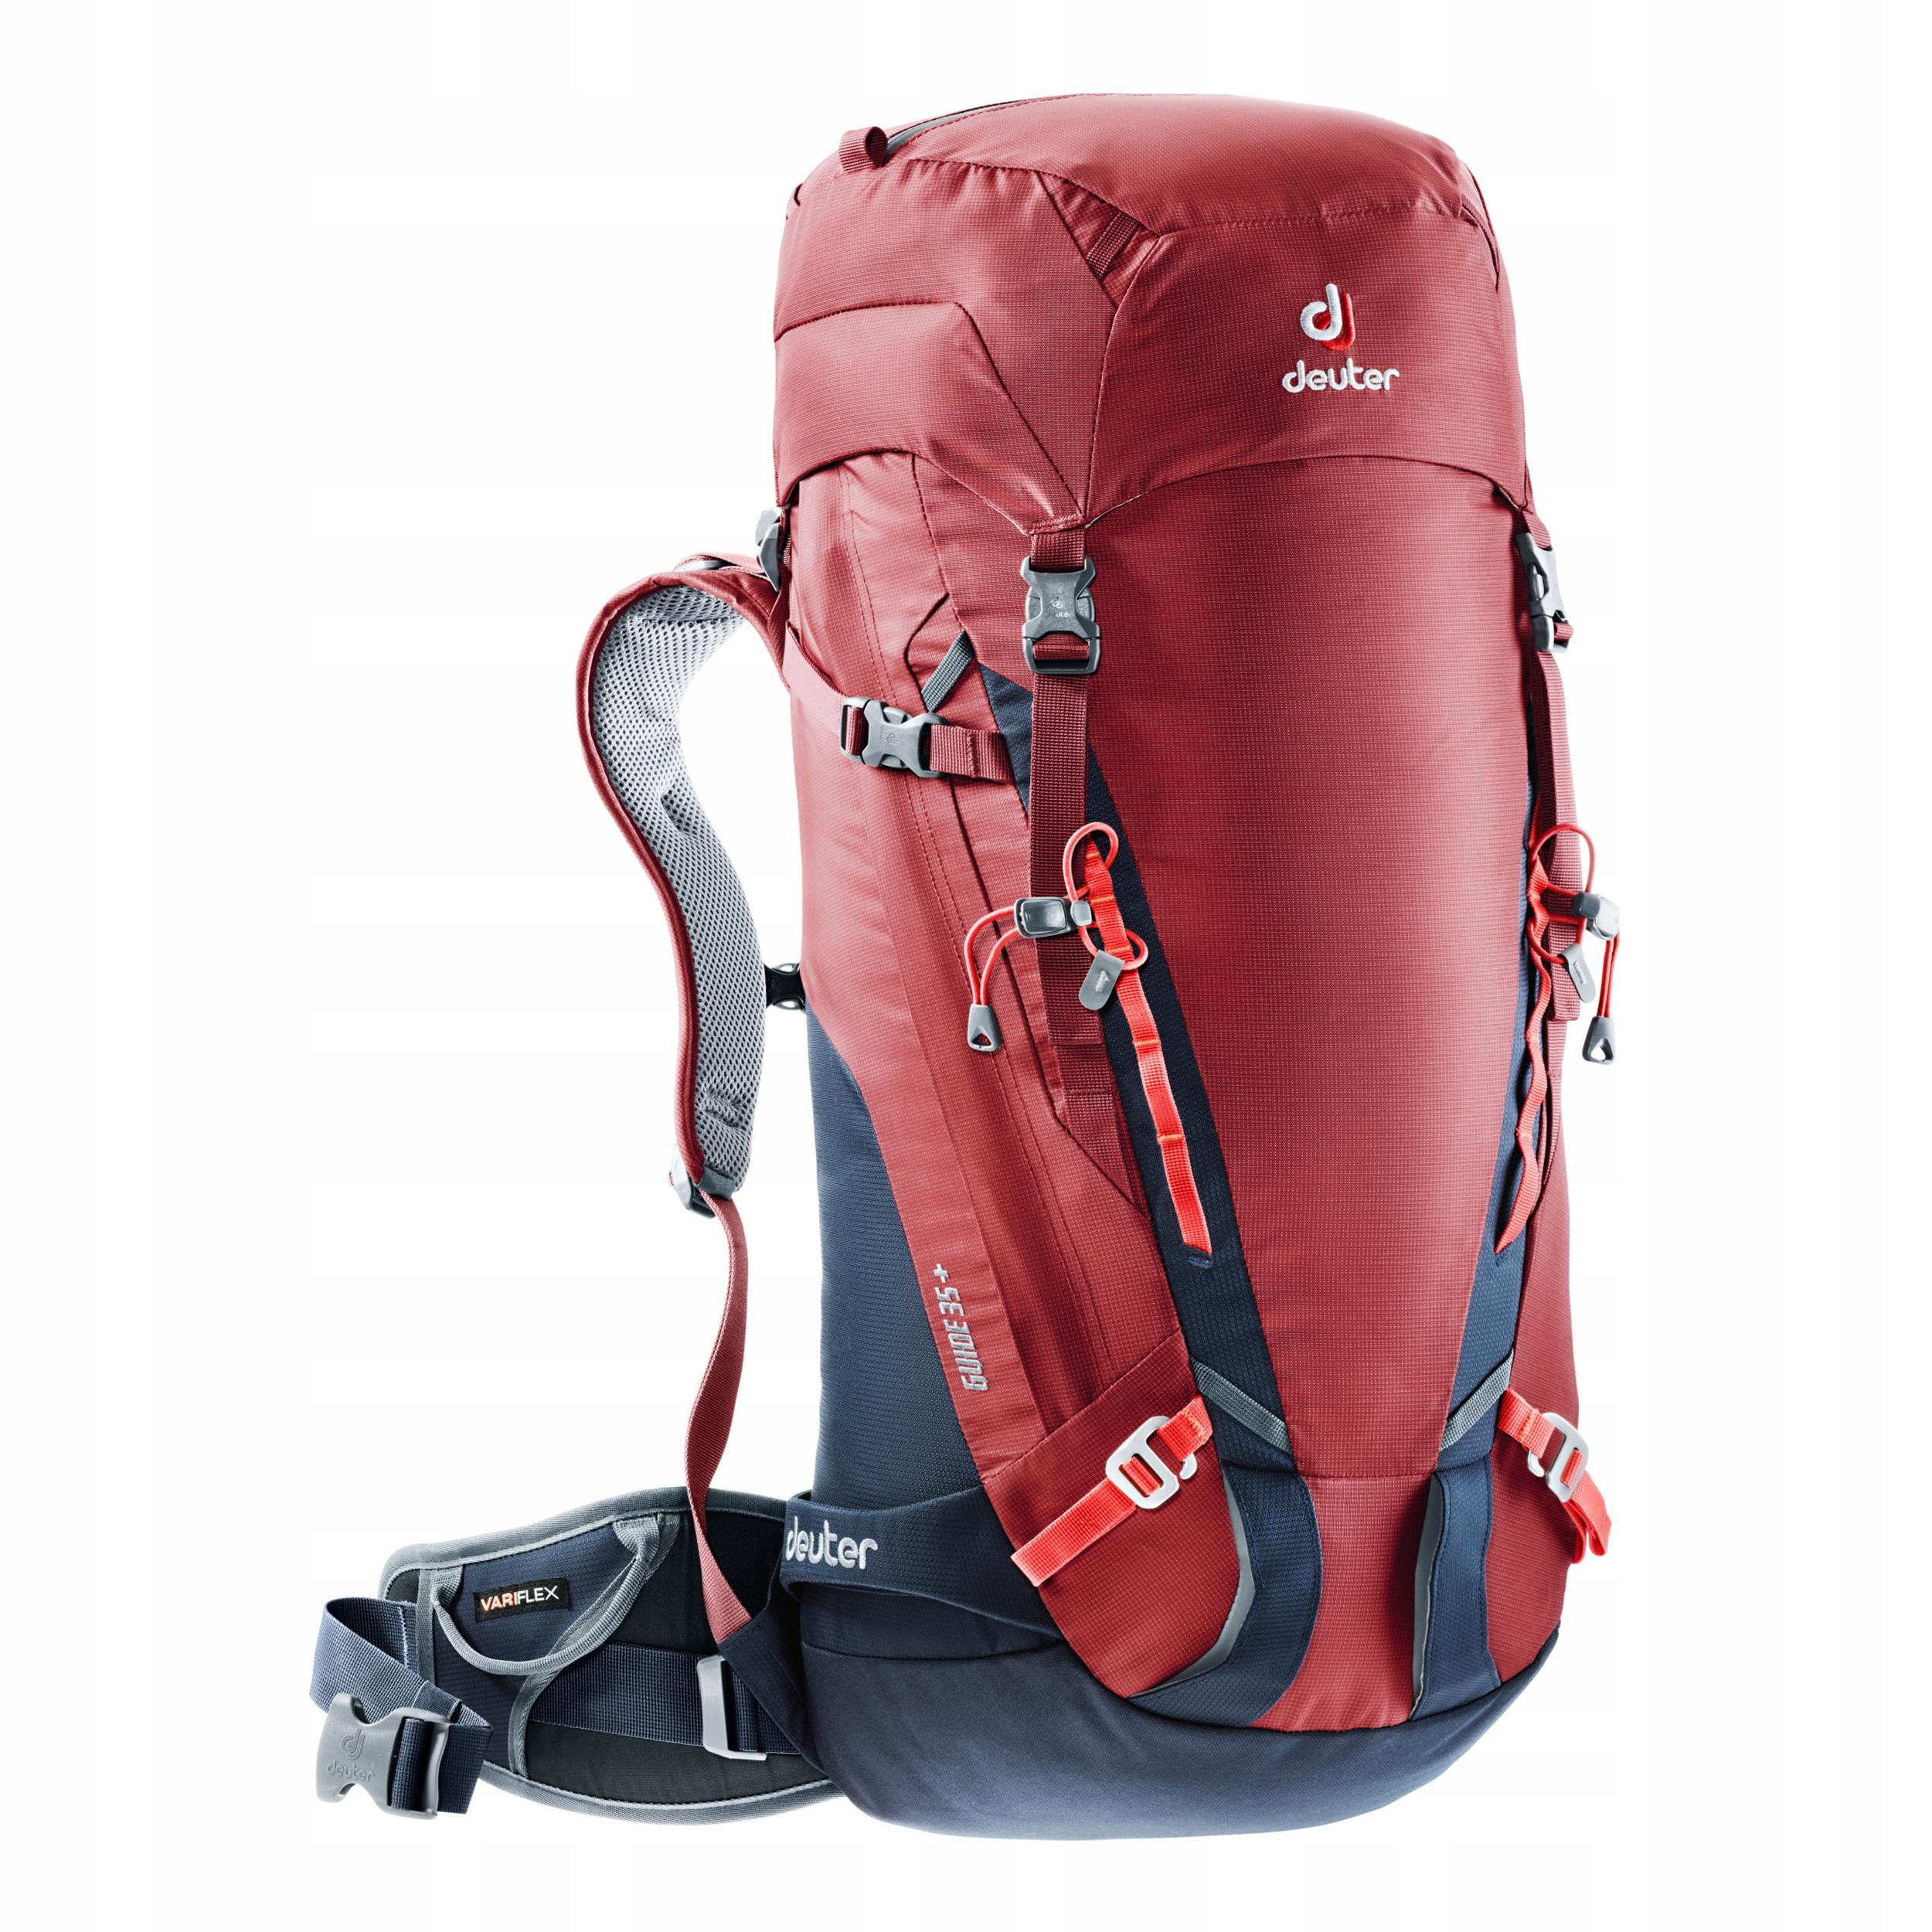 93a7c91730686 Plecak alpinistyczny Deuter Guide 35+ 7546414665 - Allegro.pl